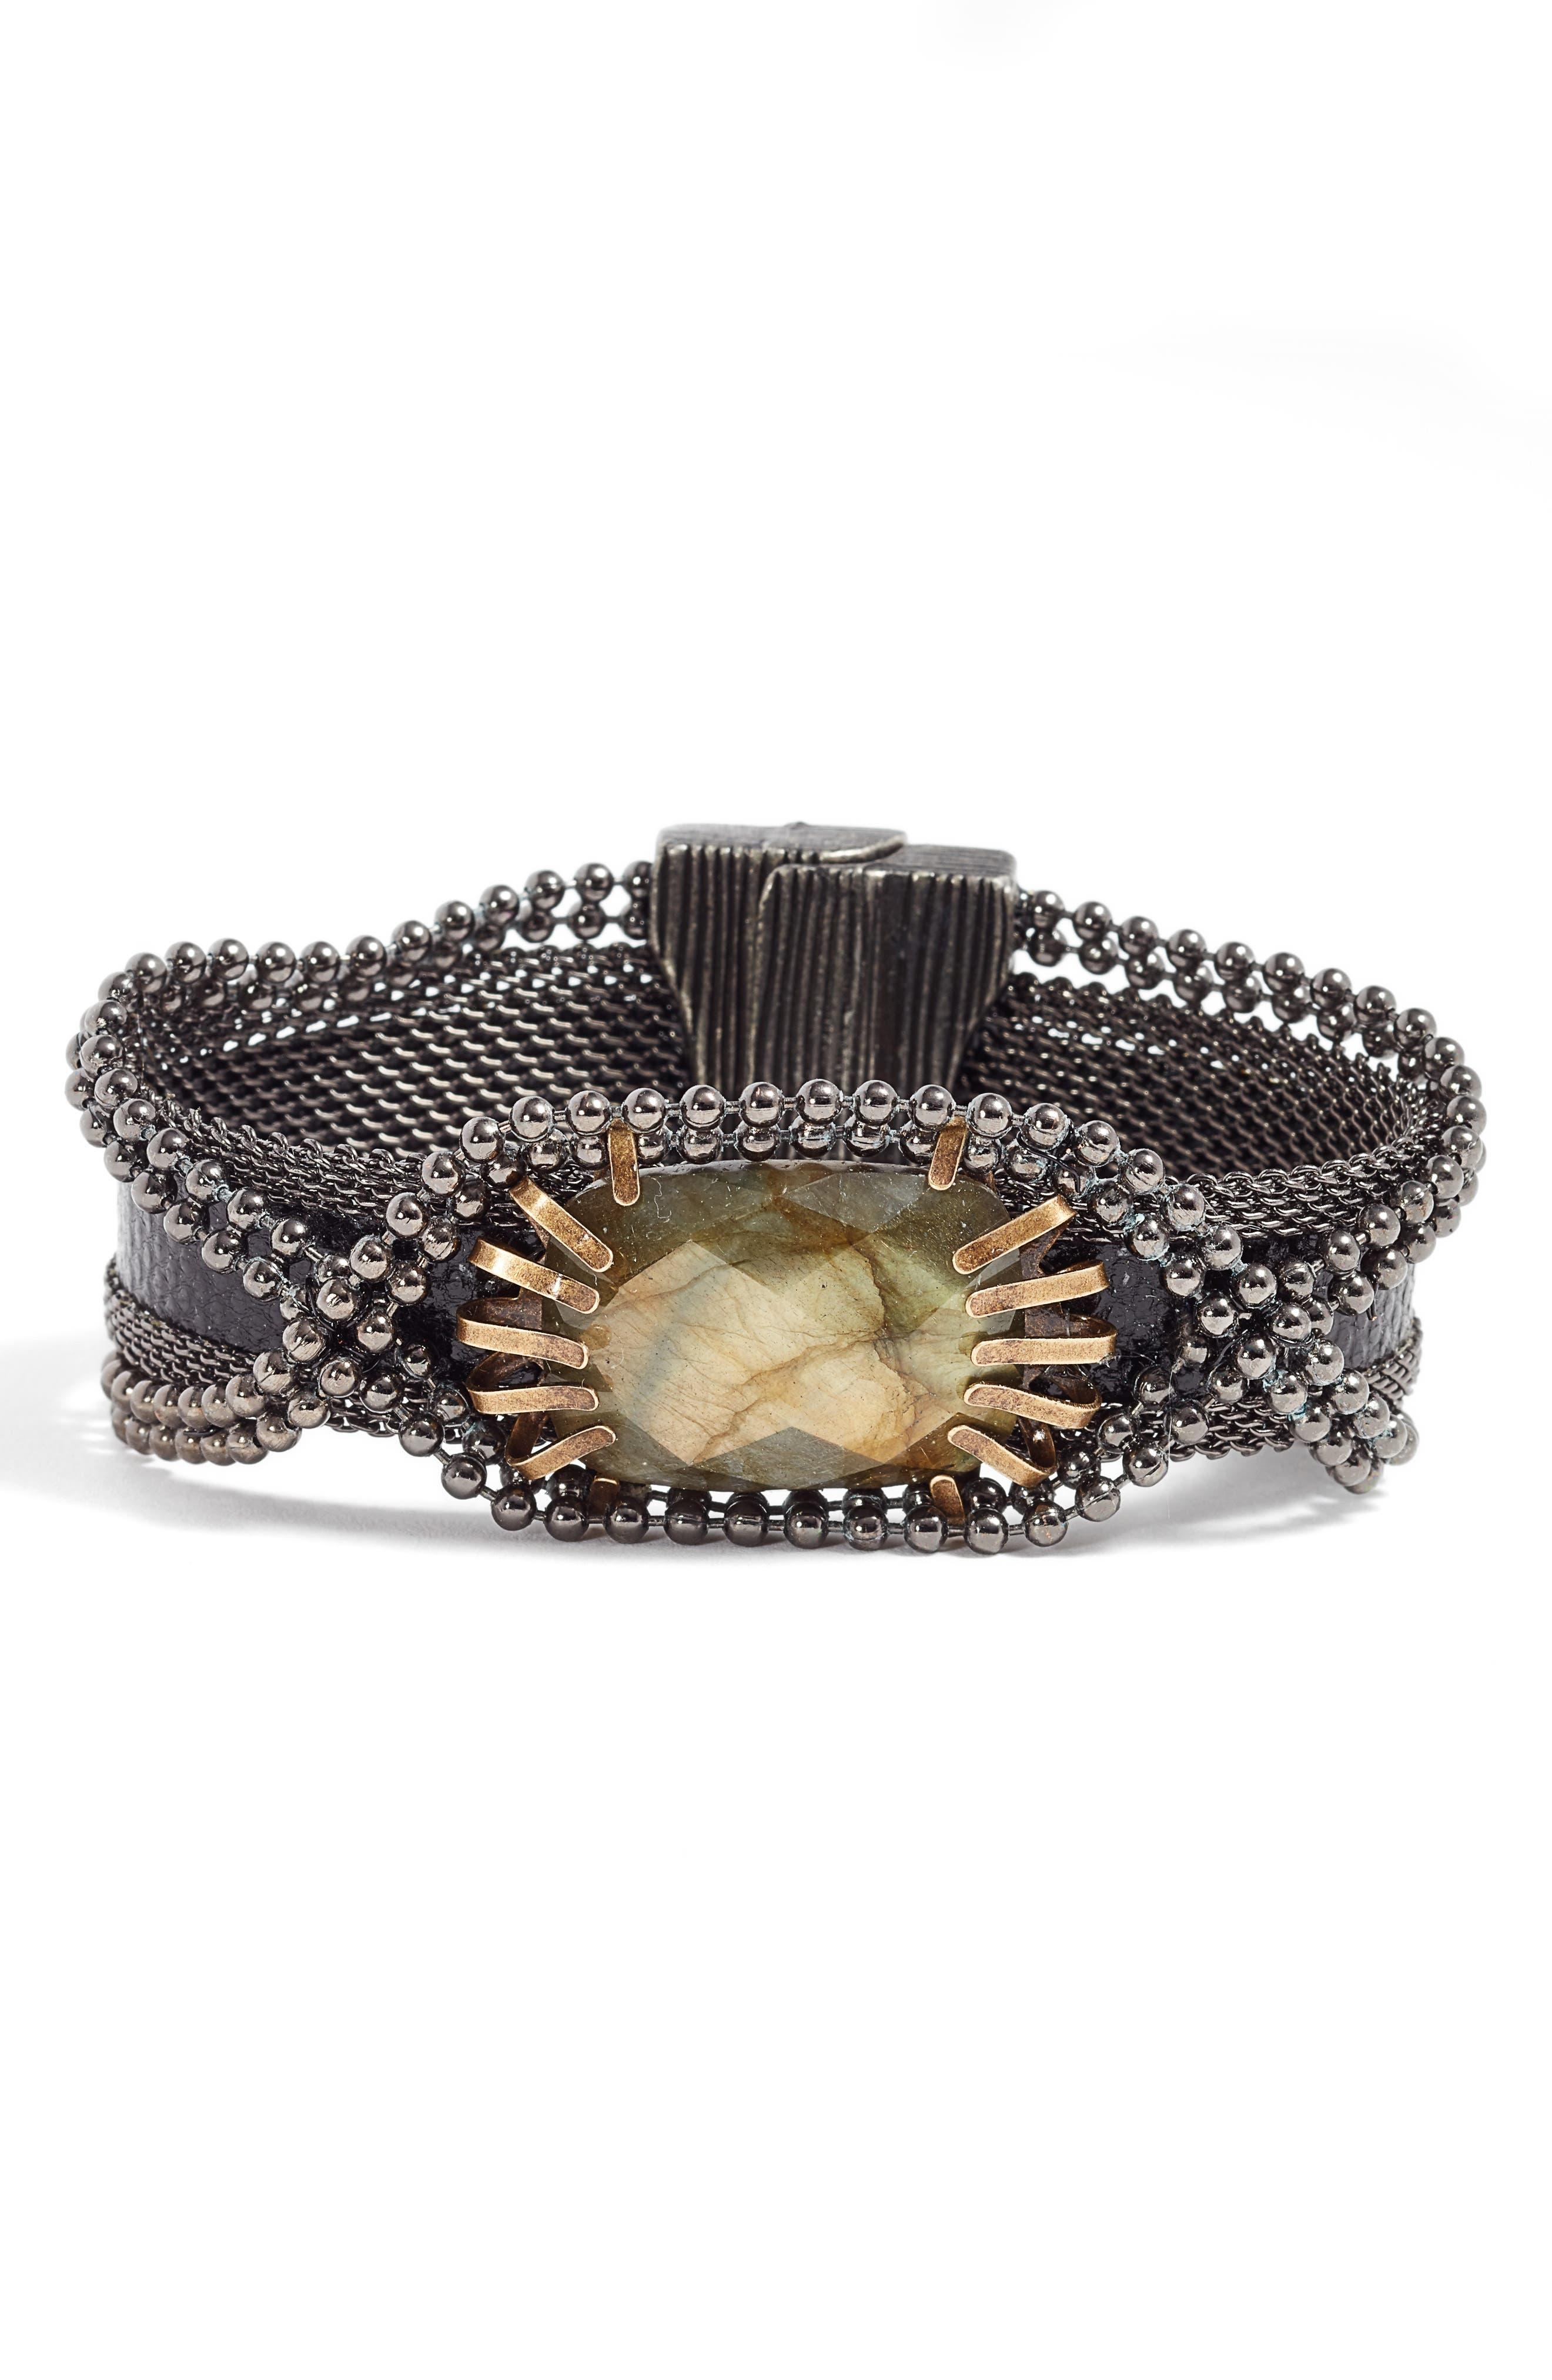 Stone & Snakeskin Bracelet,                             Main thumbnail 1, color,                             Black/ Bronze/ Gunmetal